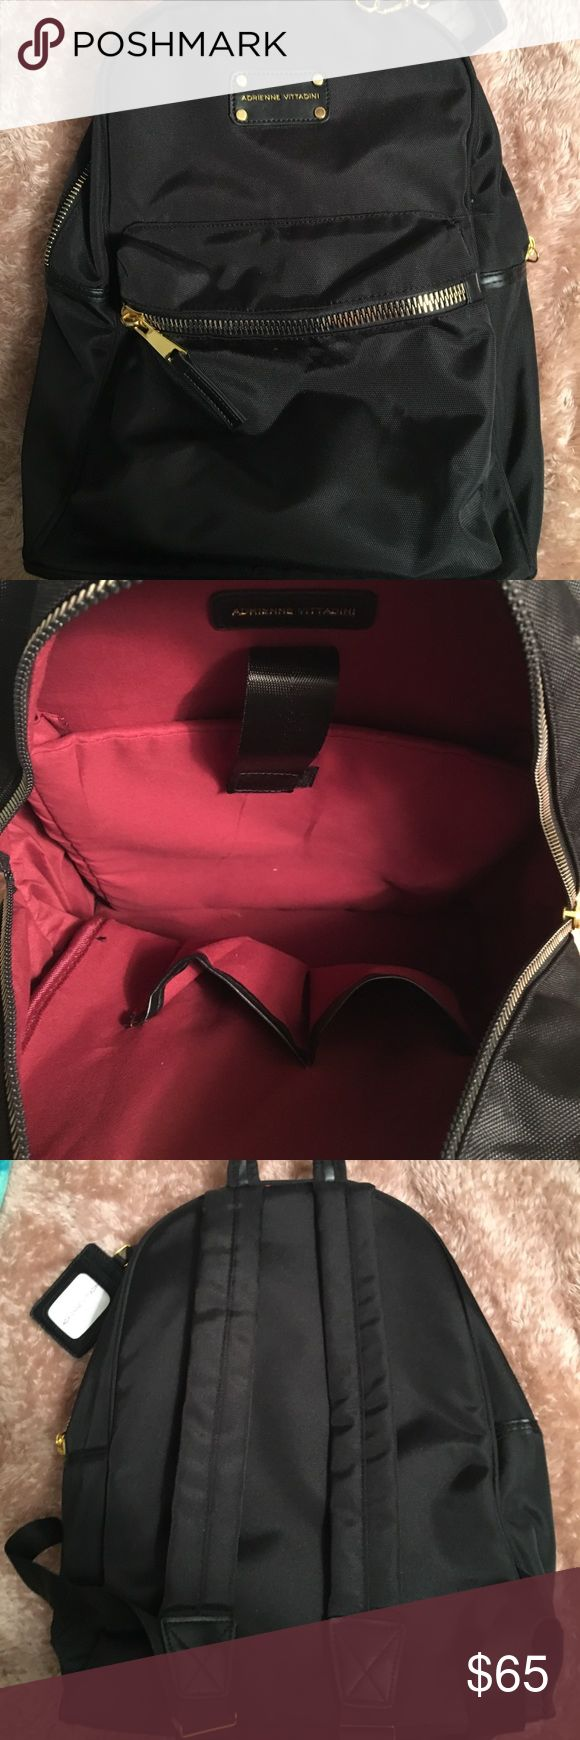 Adrienne Vittadini backpack brand new condition, u…